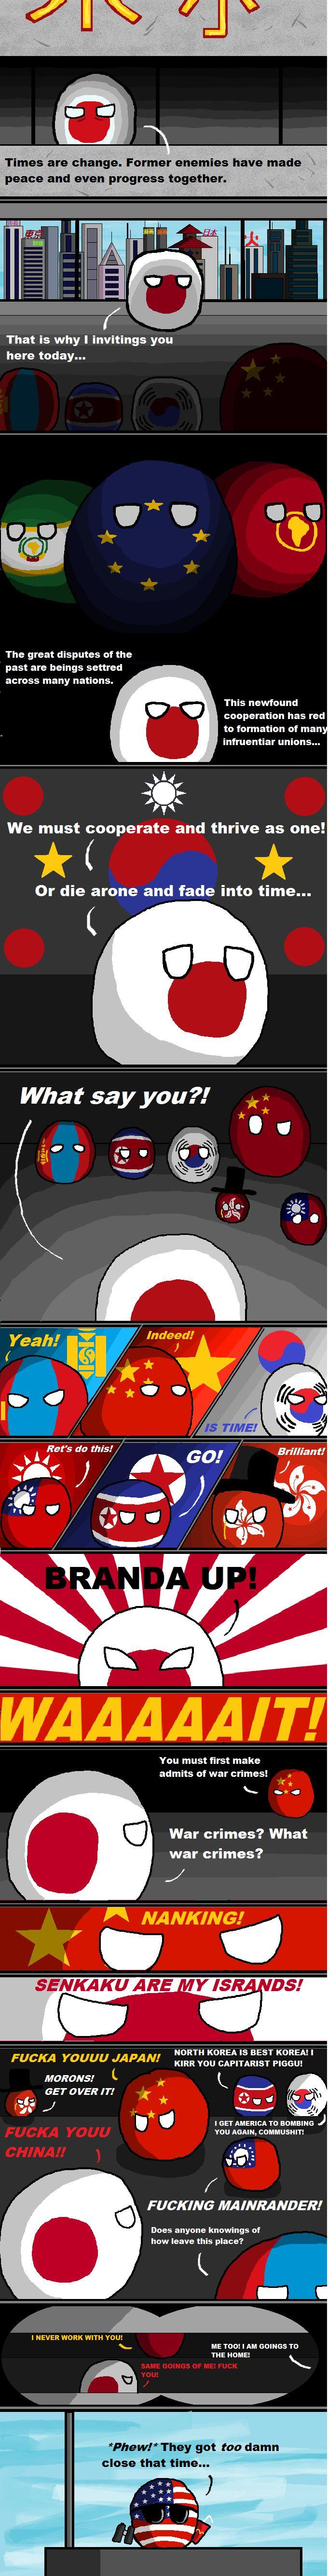 The East Asia Conference ( Japan, Mongolia, China, South Korea, Taiwan, North Korea, Hong Kong, USA ) by Pan Aaron  #polandball #countryball